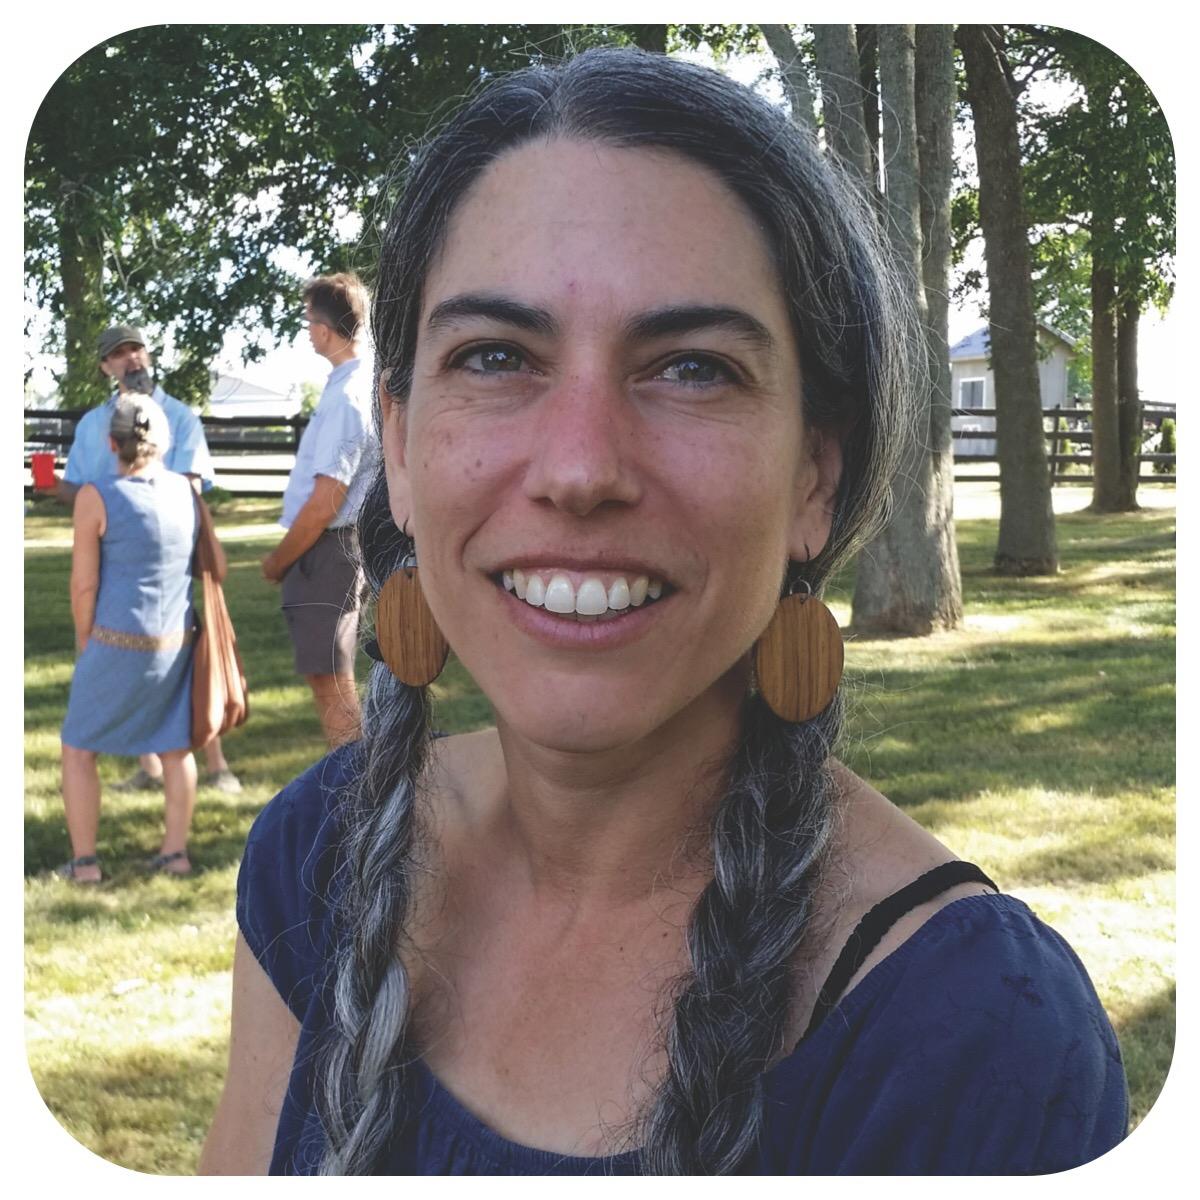 Healthy Living Now - Tamara Segal - Contributors - Meet Our Team